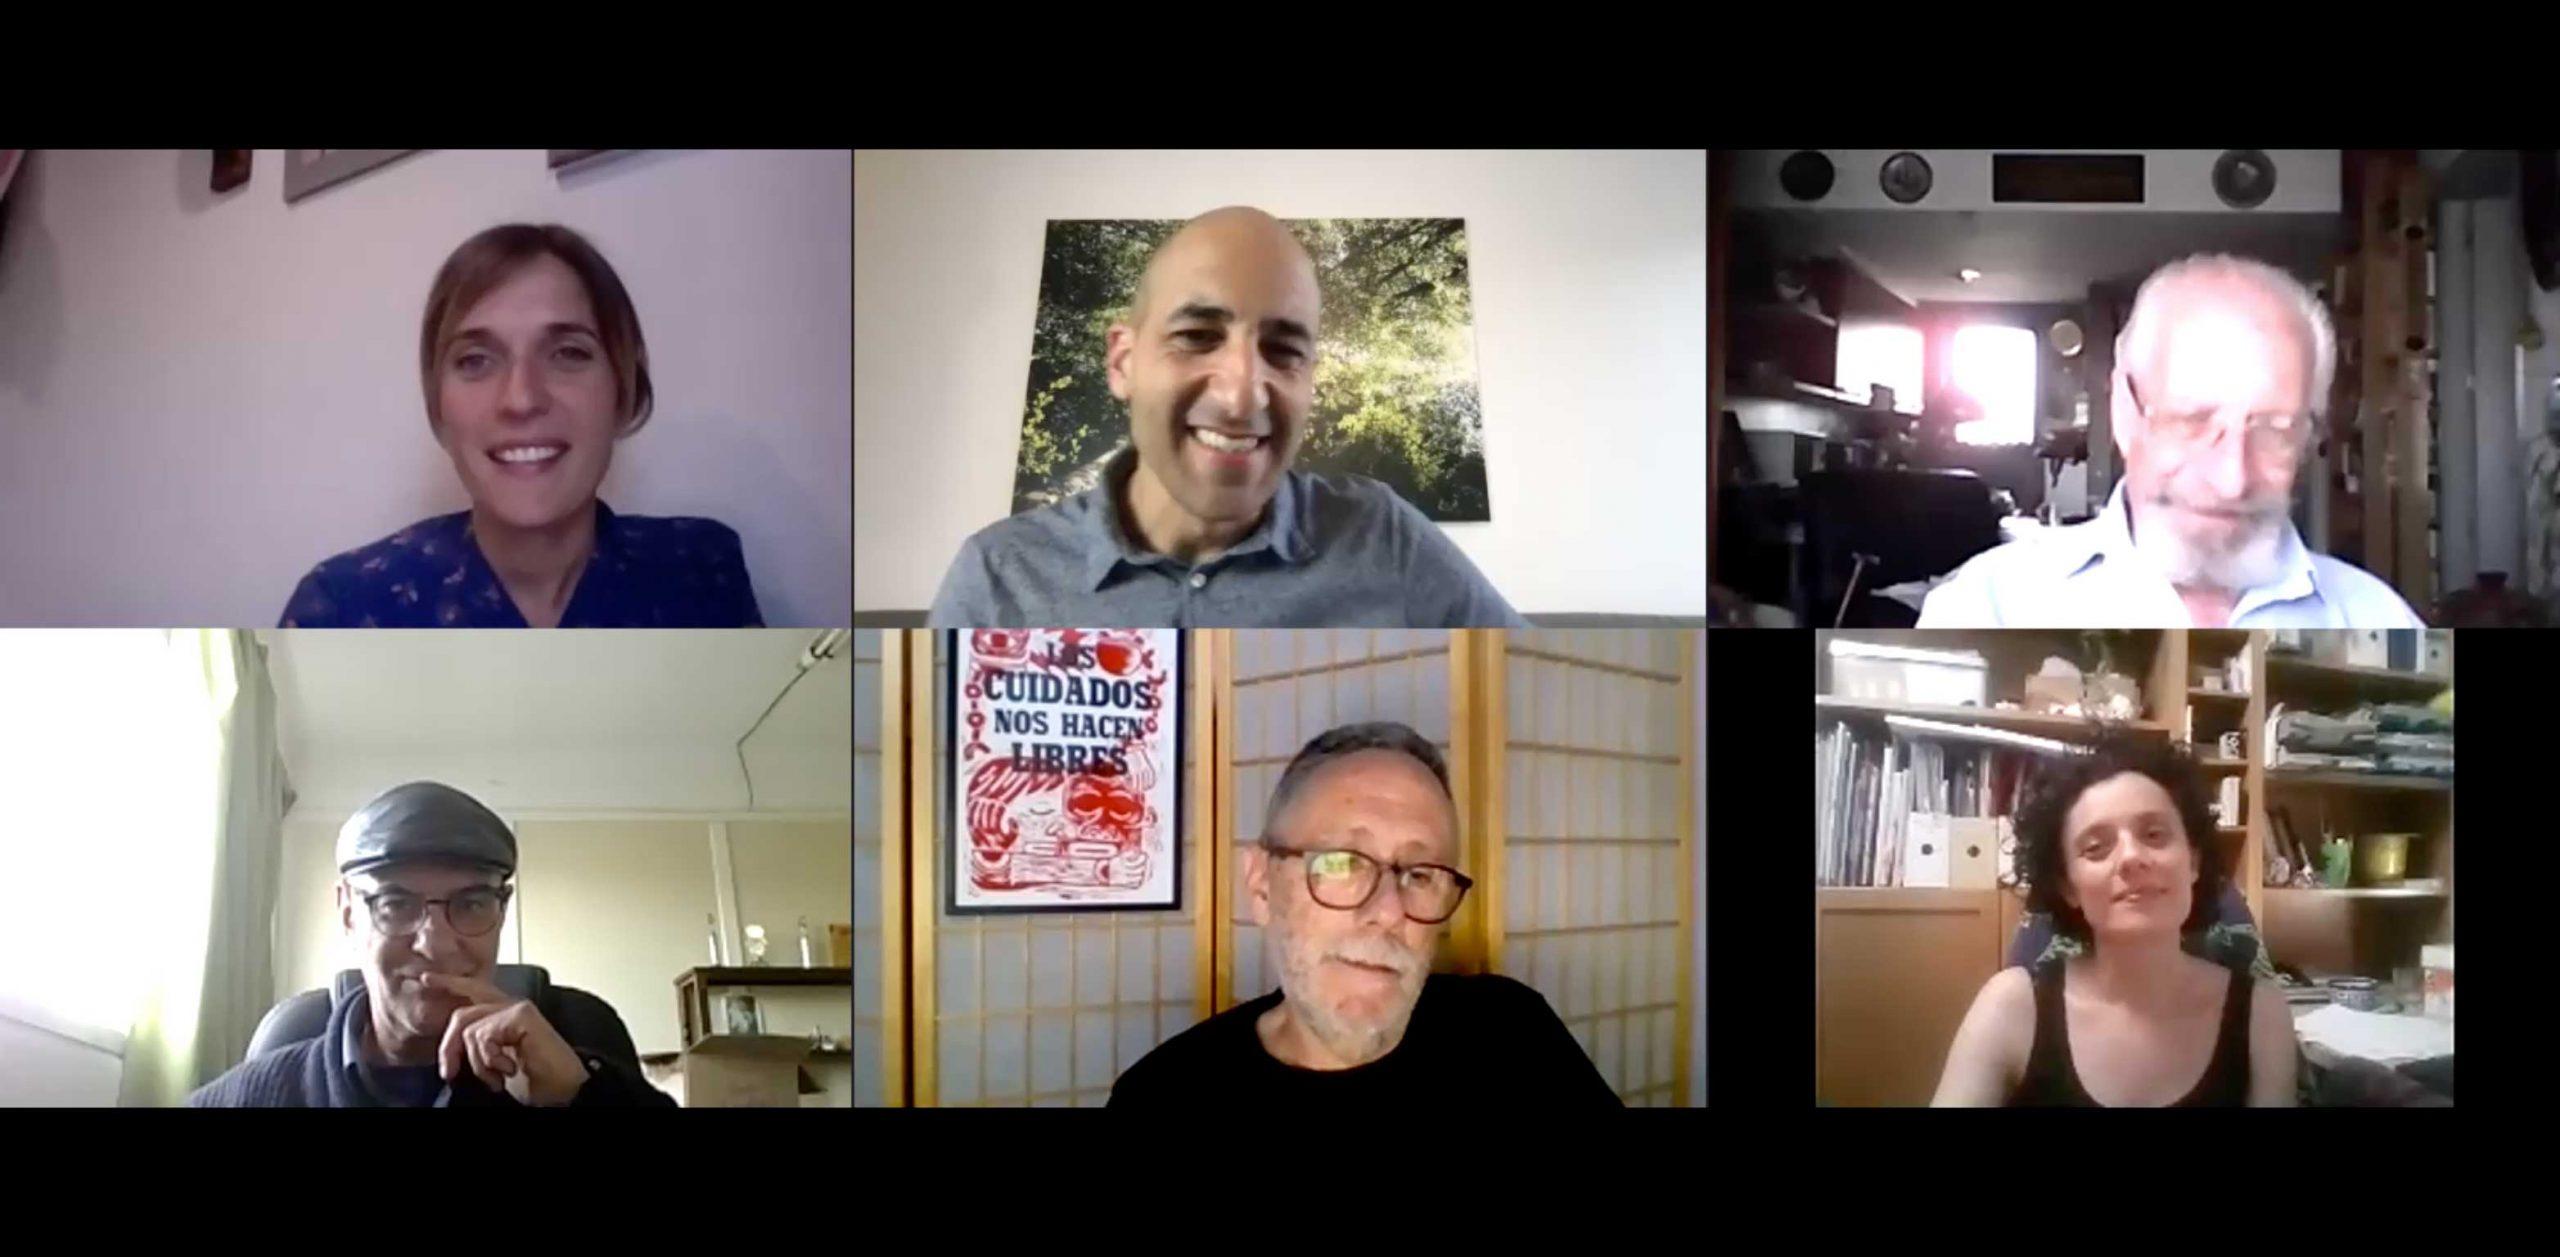 cohabitar live encuentro vídeo congreso virtual vivienda colaborativa ariwake cohousing